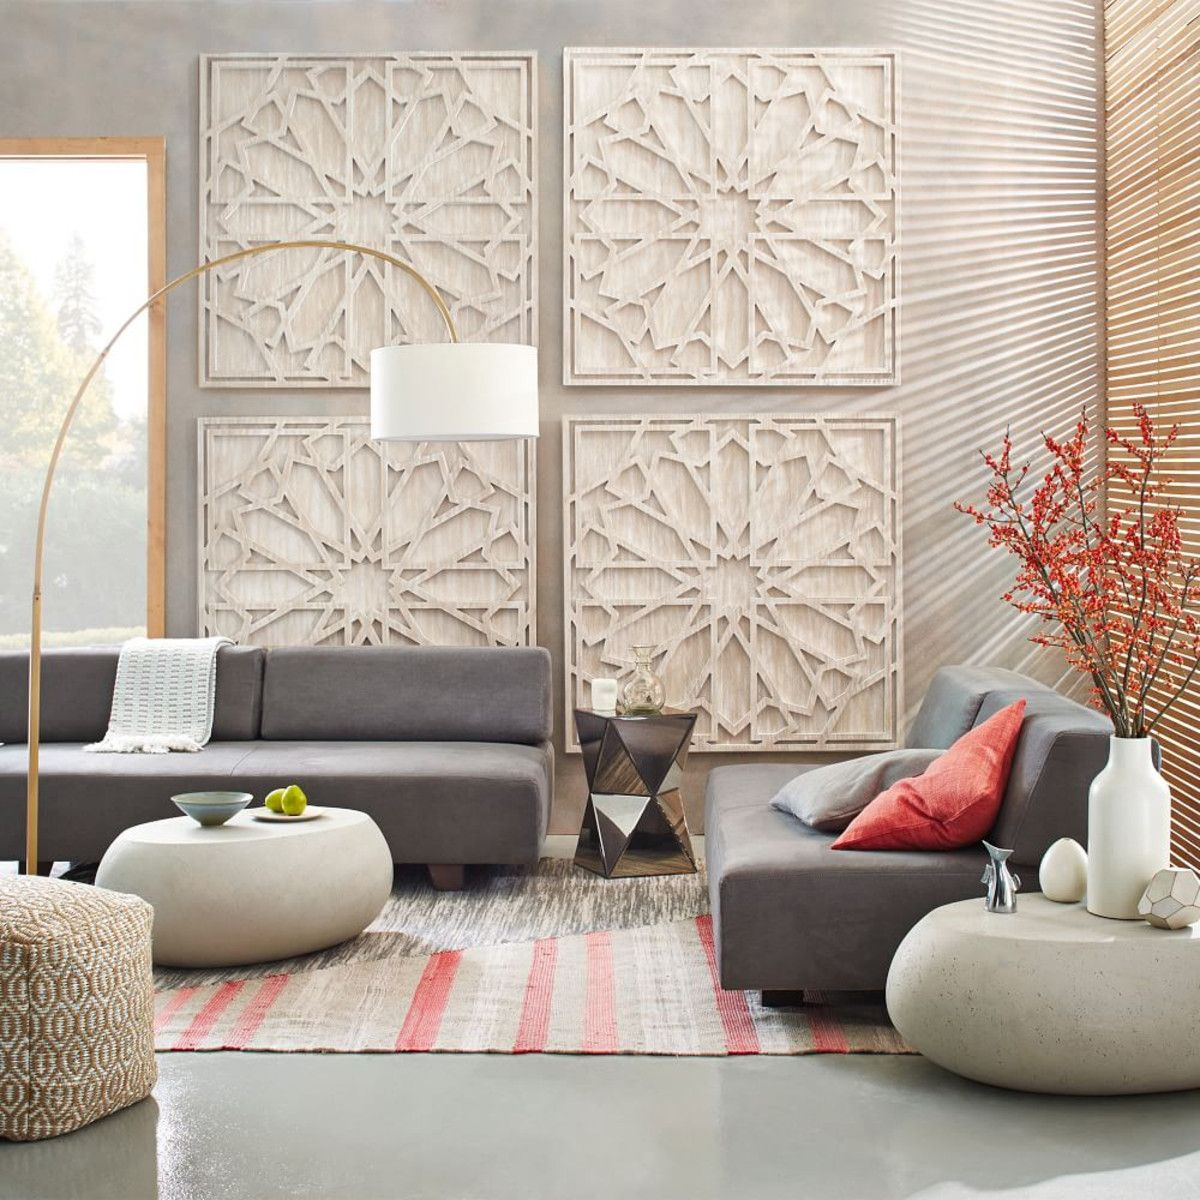 Whitewashed Wood Wall Art | Whitewash wood, Wood wall art and Wood walls